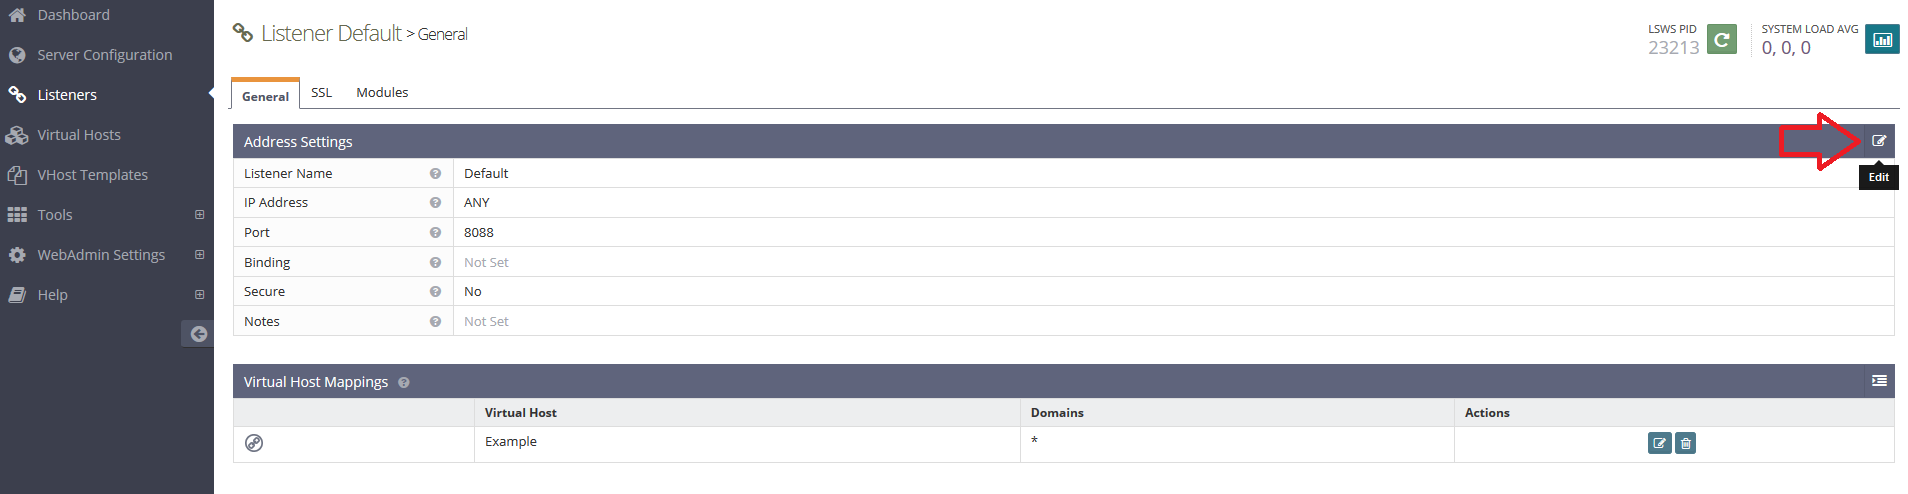 Установка WordPress с OpenLiteSpeed на Ubuntu 16.04